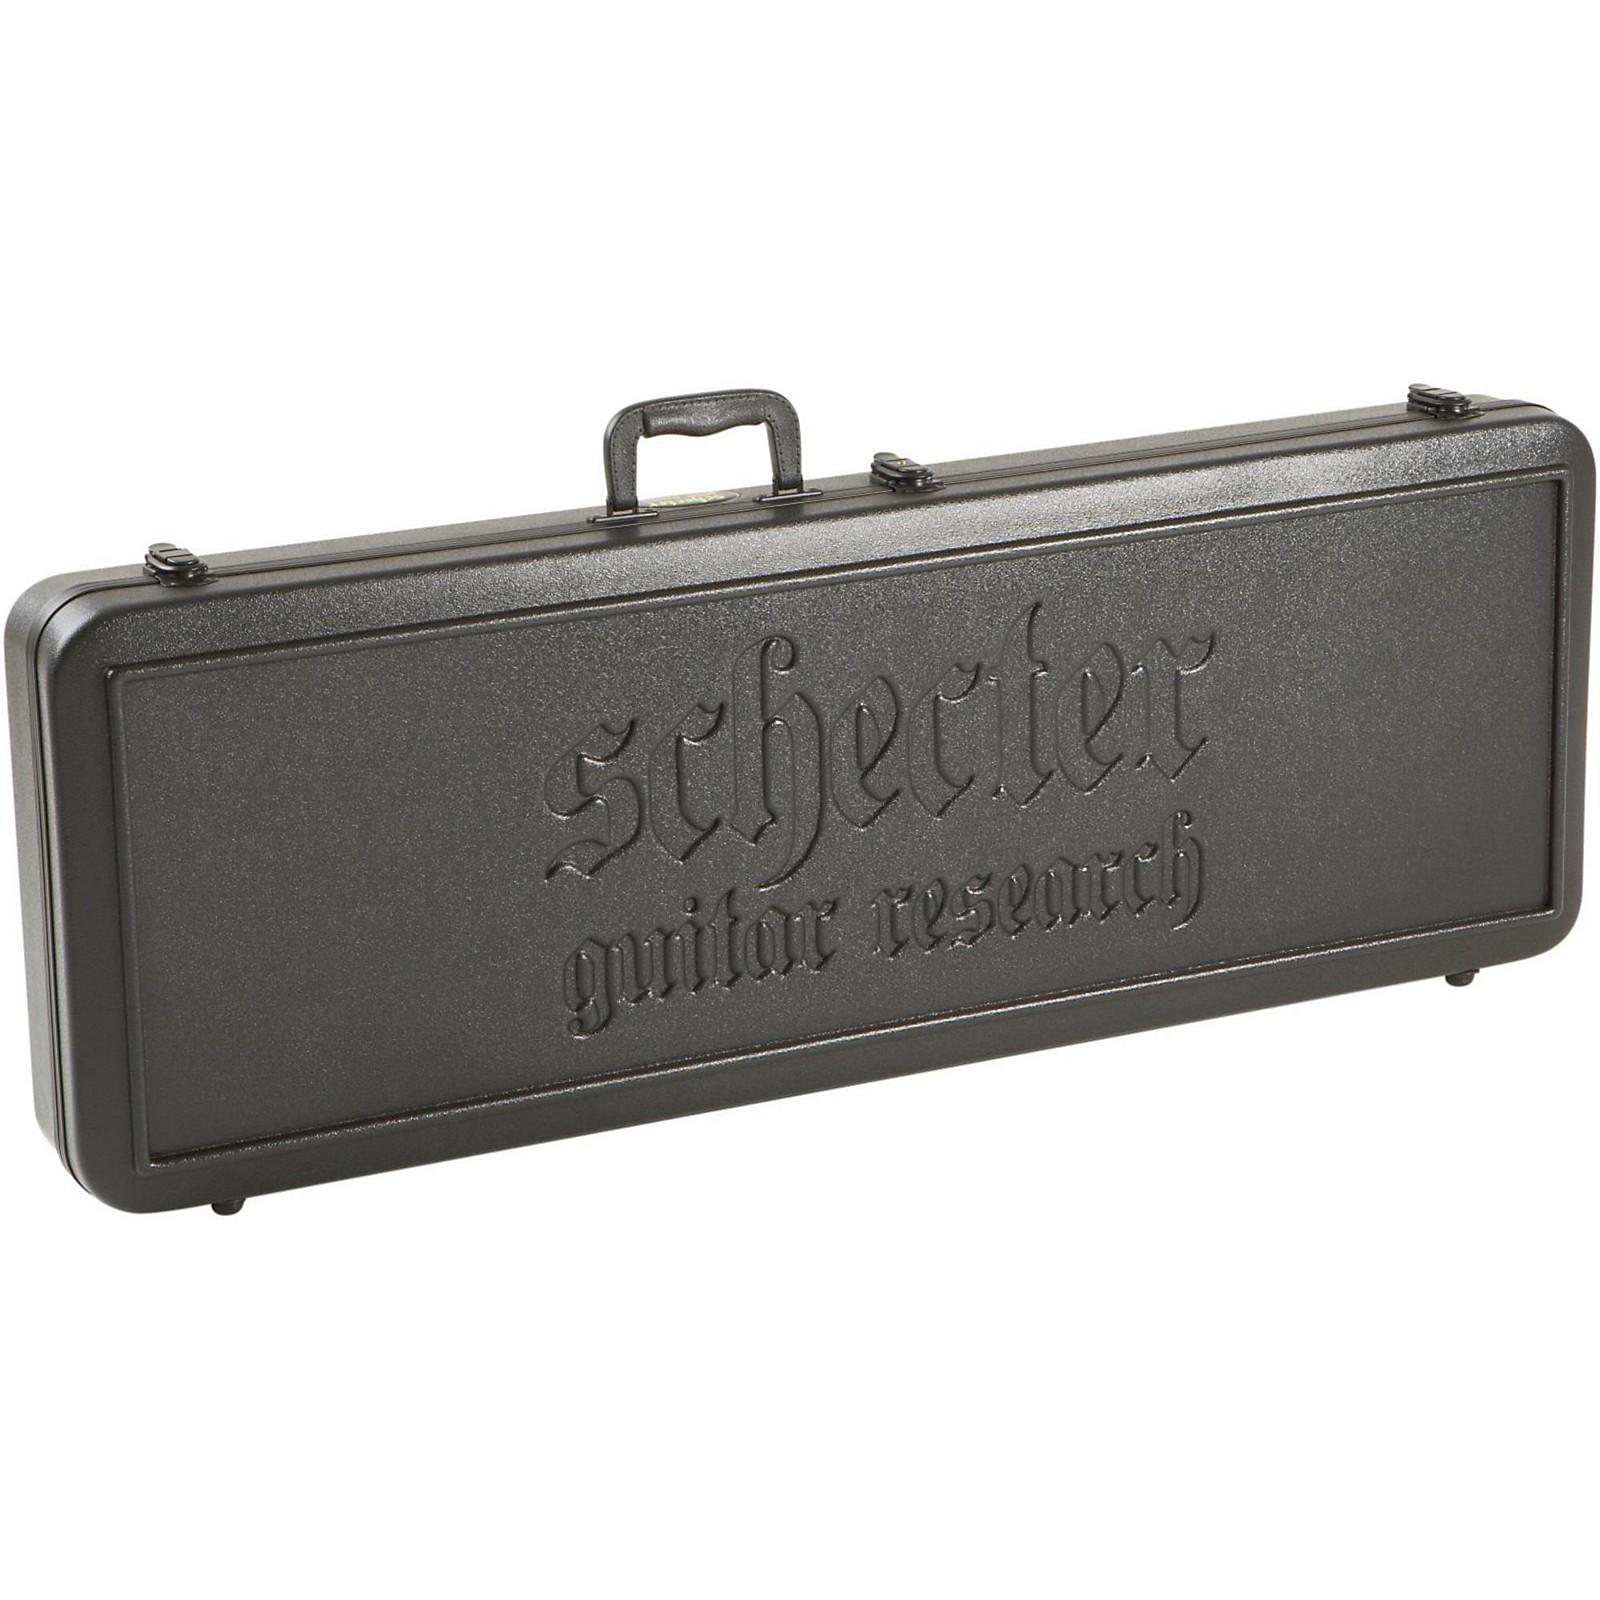 Schecter Guitar Research Diamond Series SGR-1C Molded Guitar Case